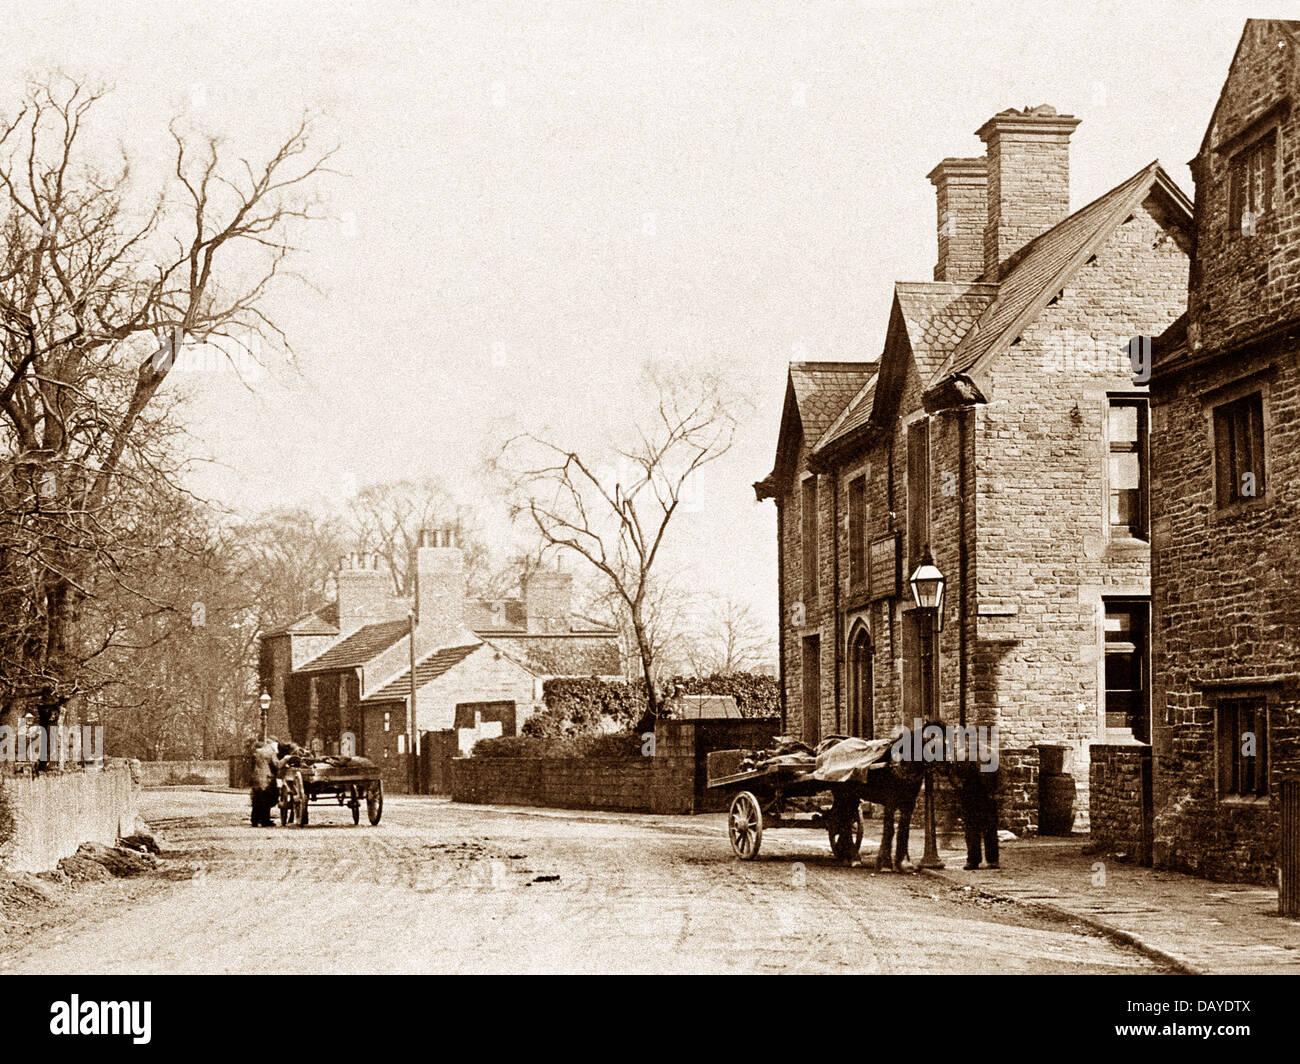 Methley early 1900s - Stock Image